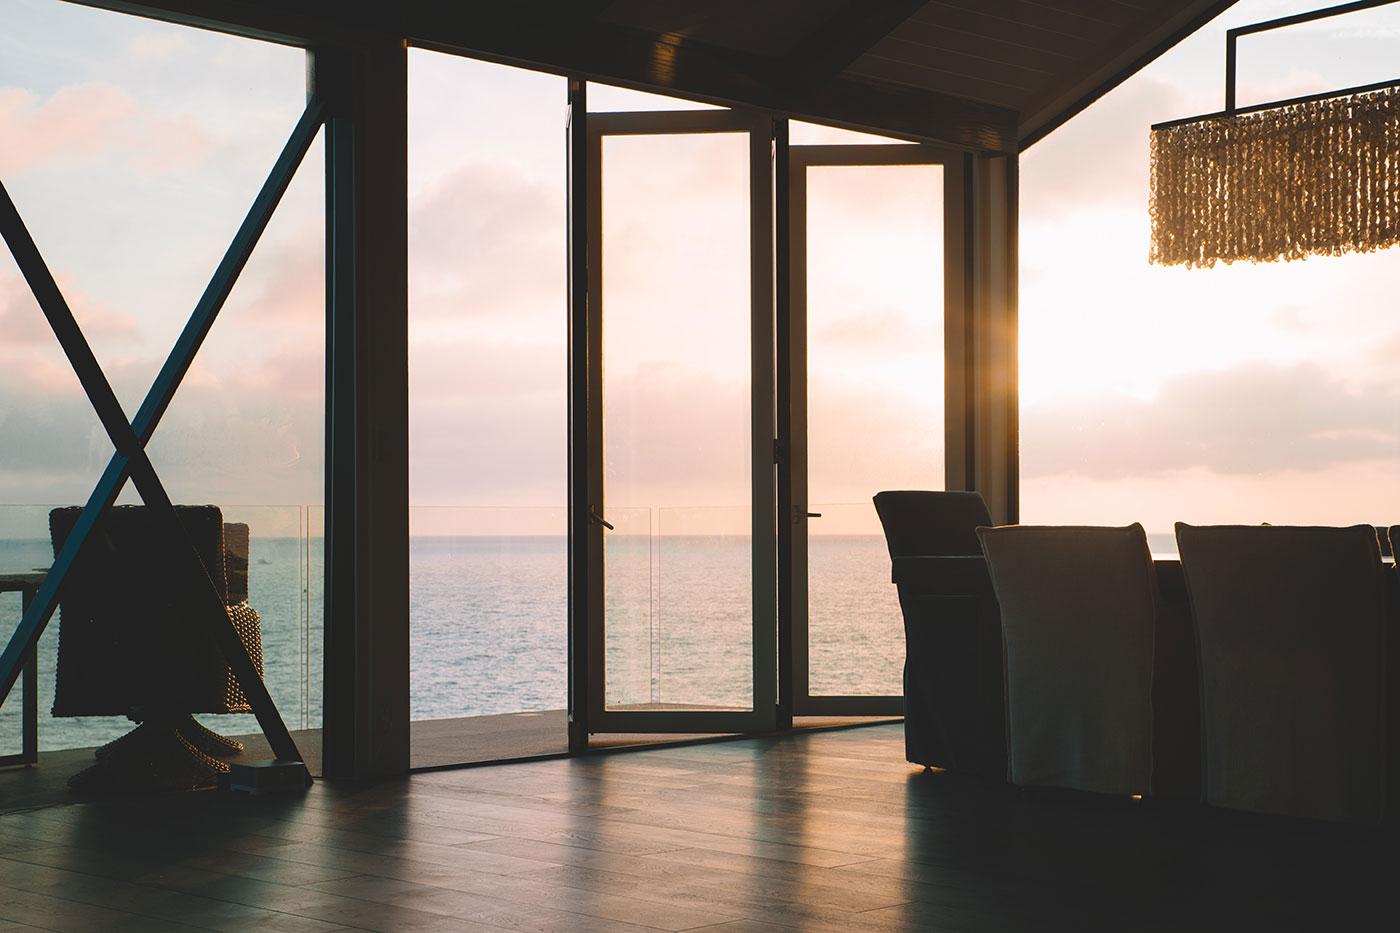 Solar WindowFilm